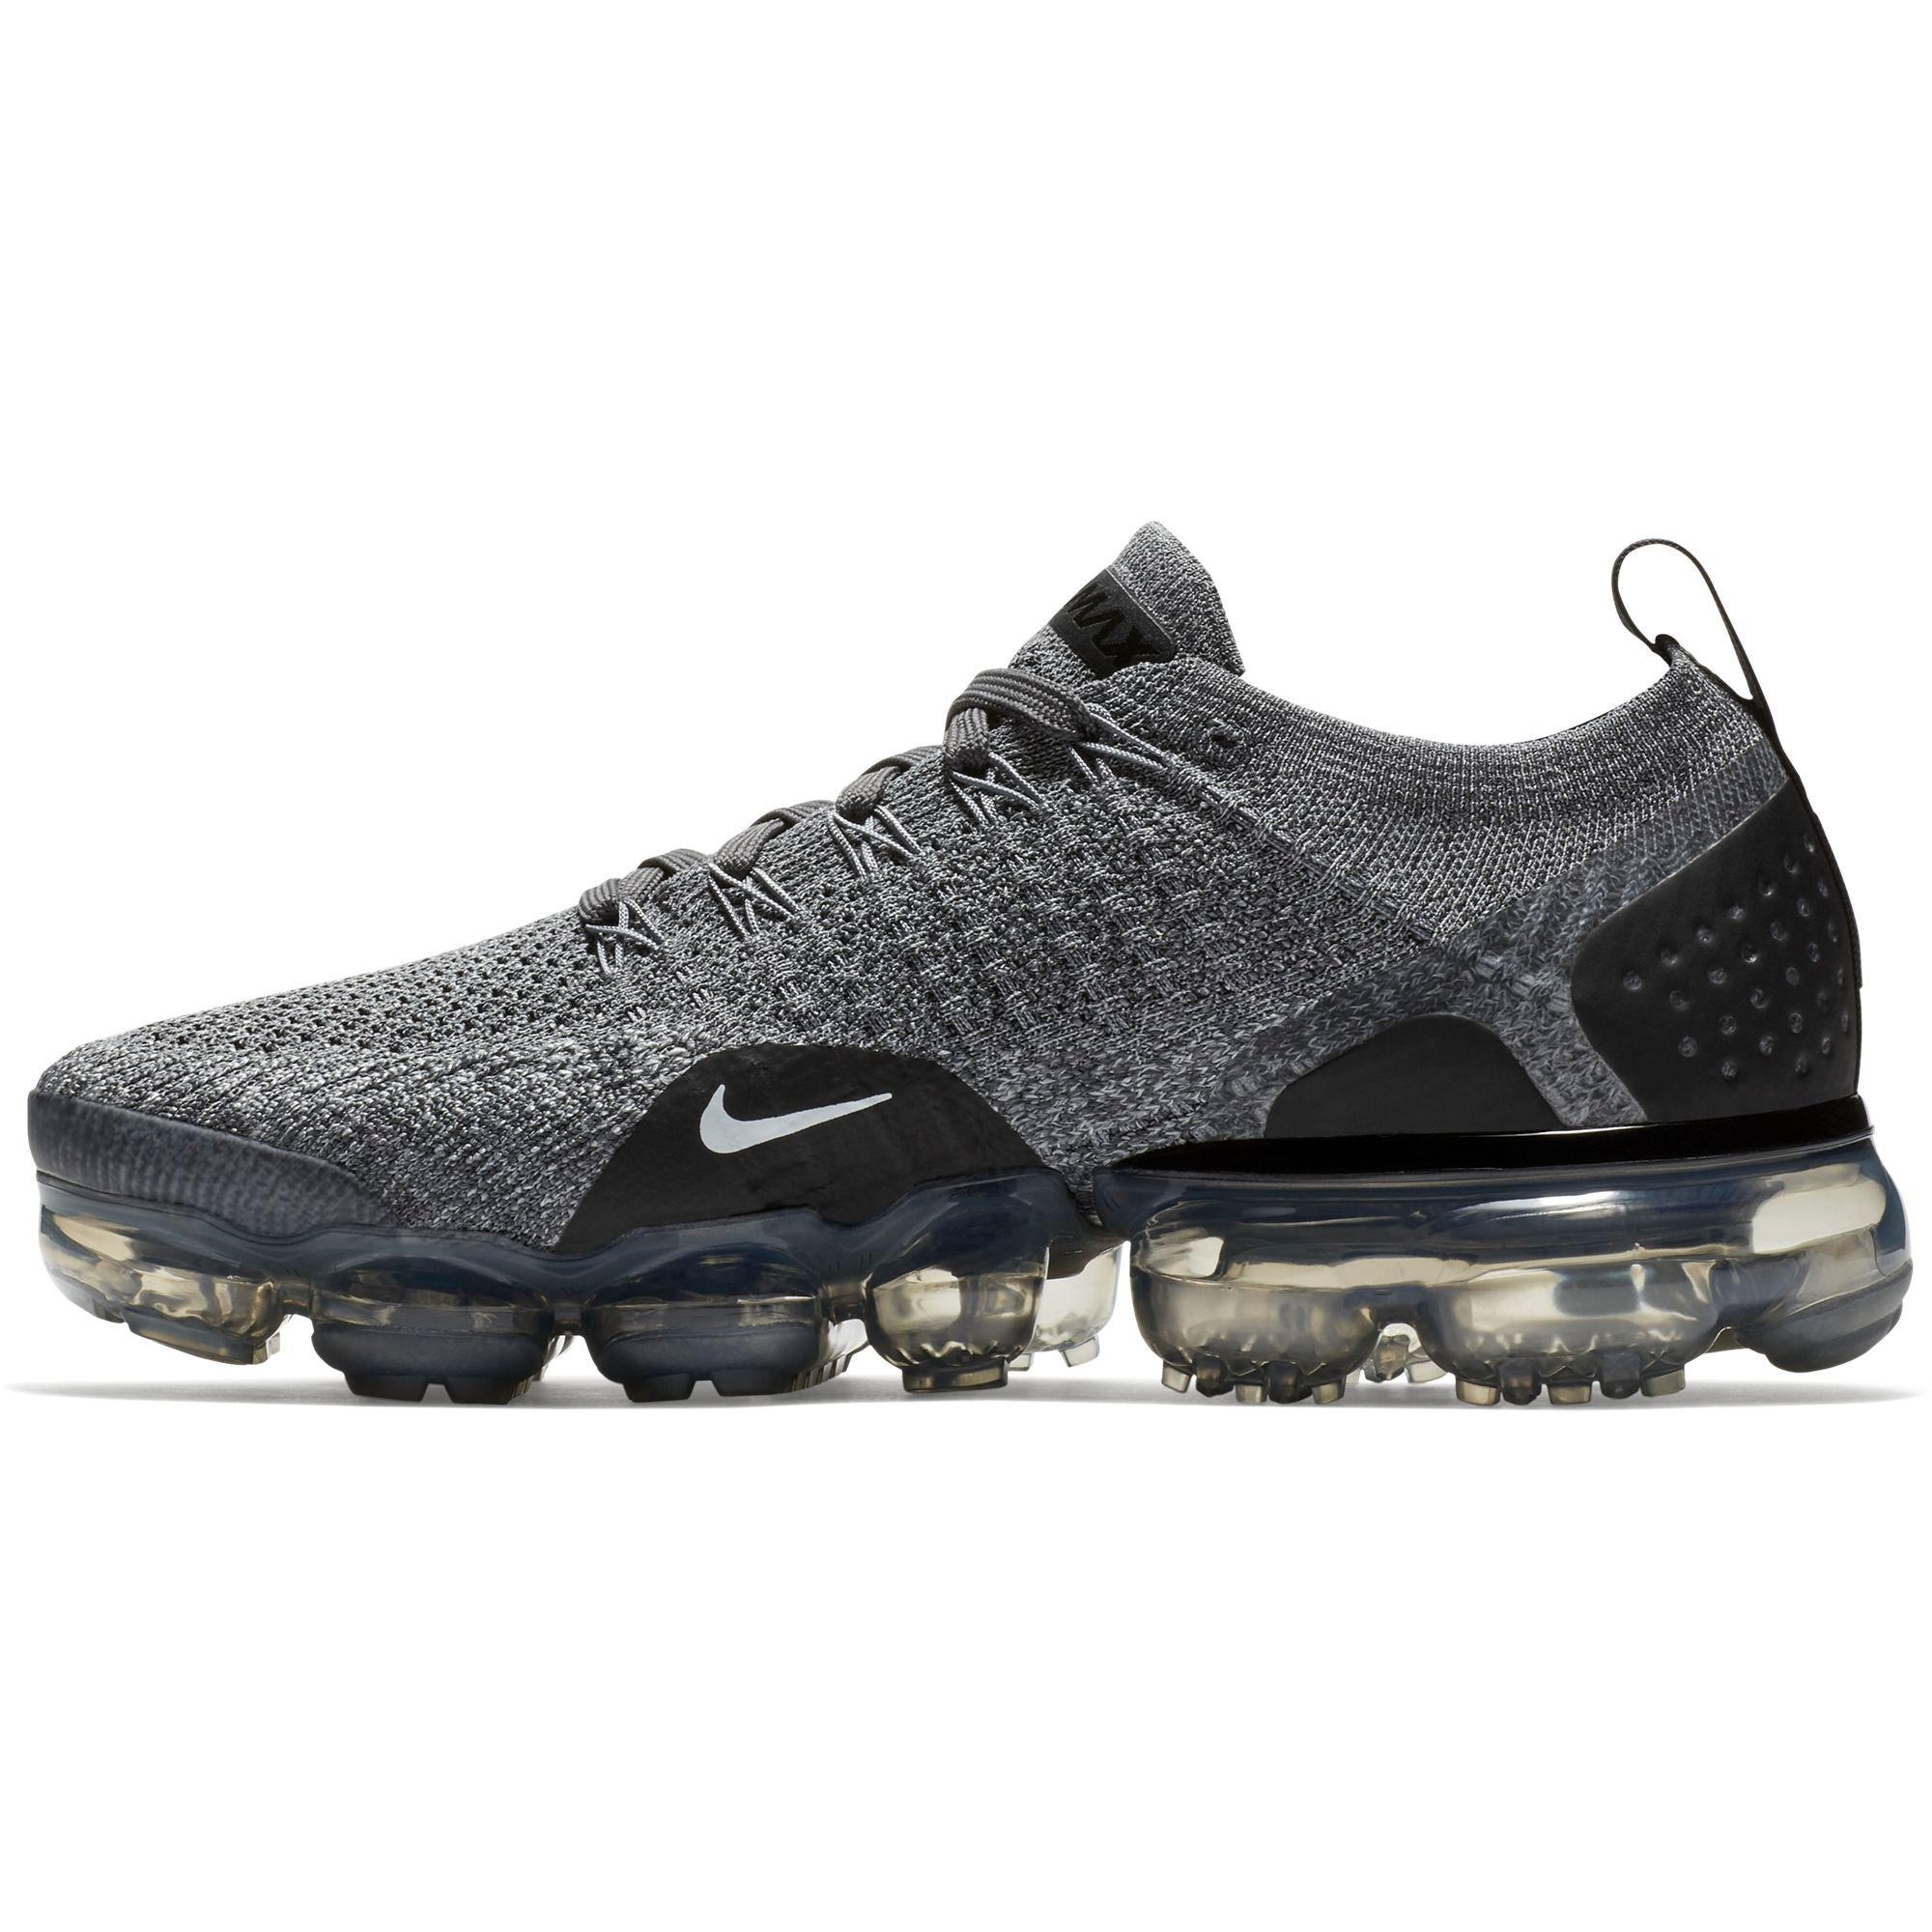 1e689841a855 Nike Air Vapormax Dark Grey - Notary Chamber